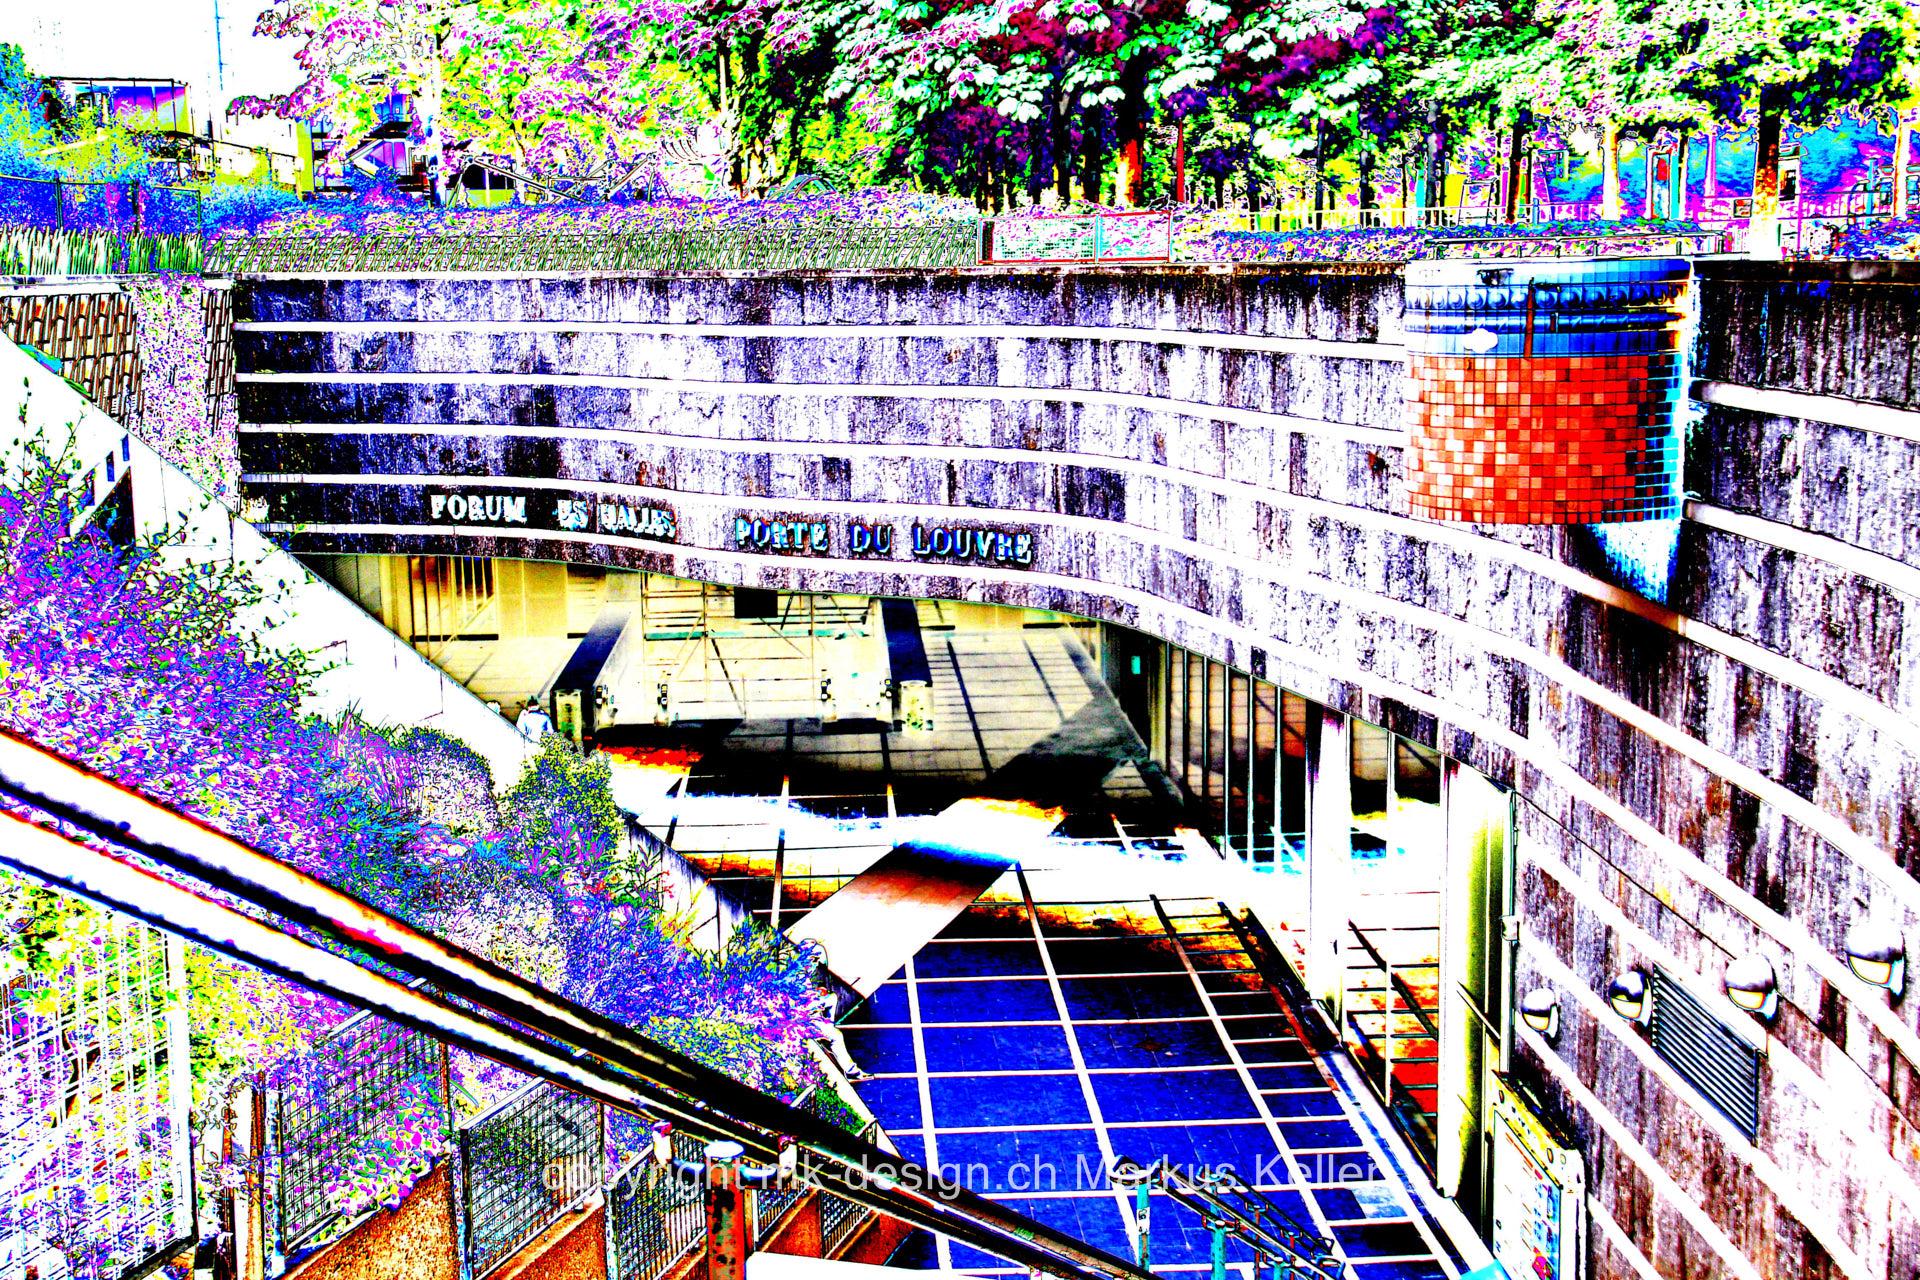 Bauwerk   Park/Platz/Strasse